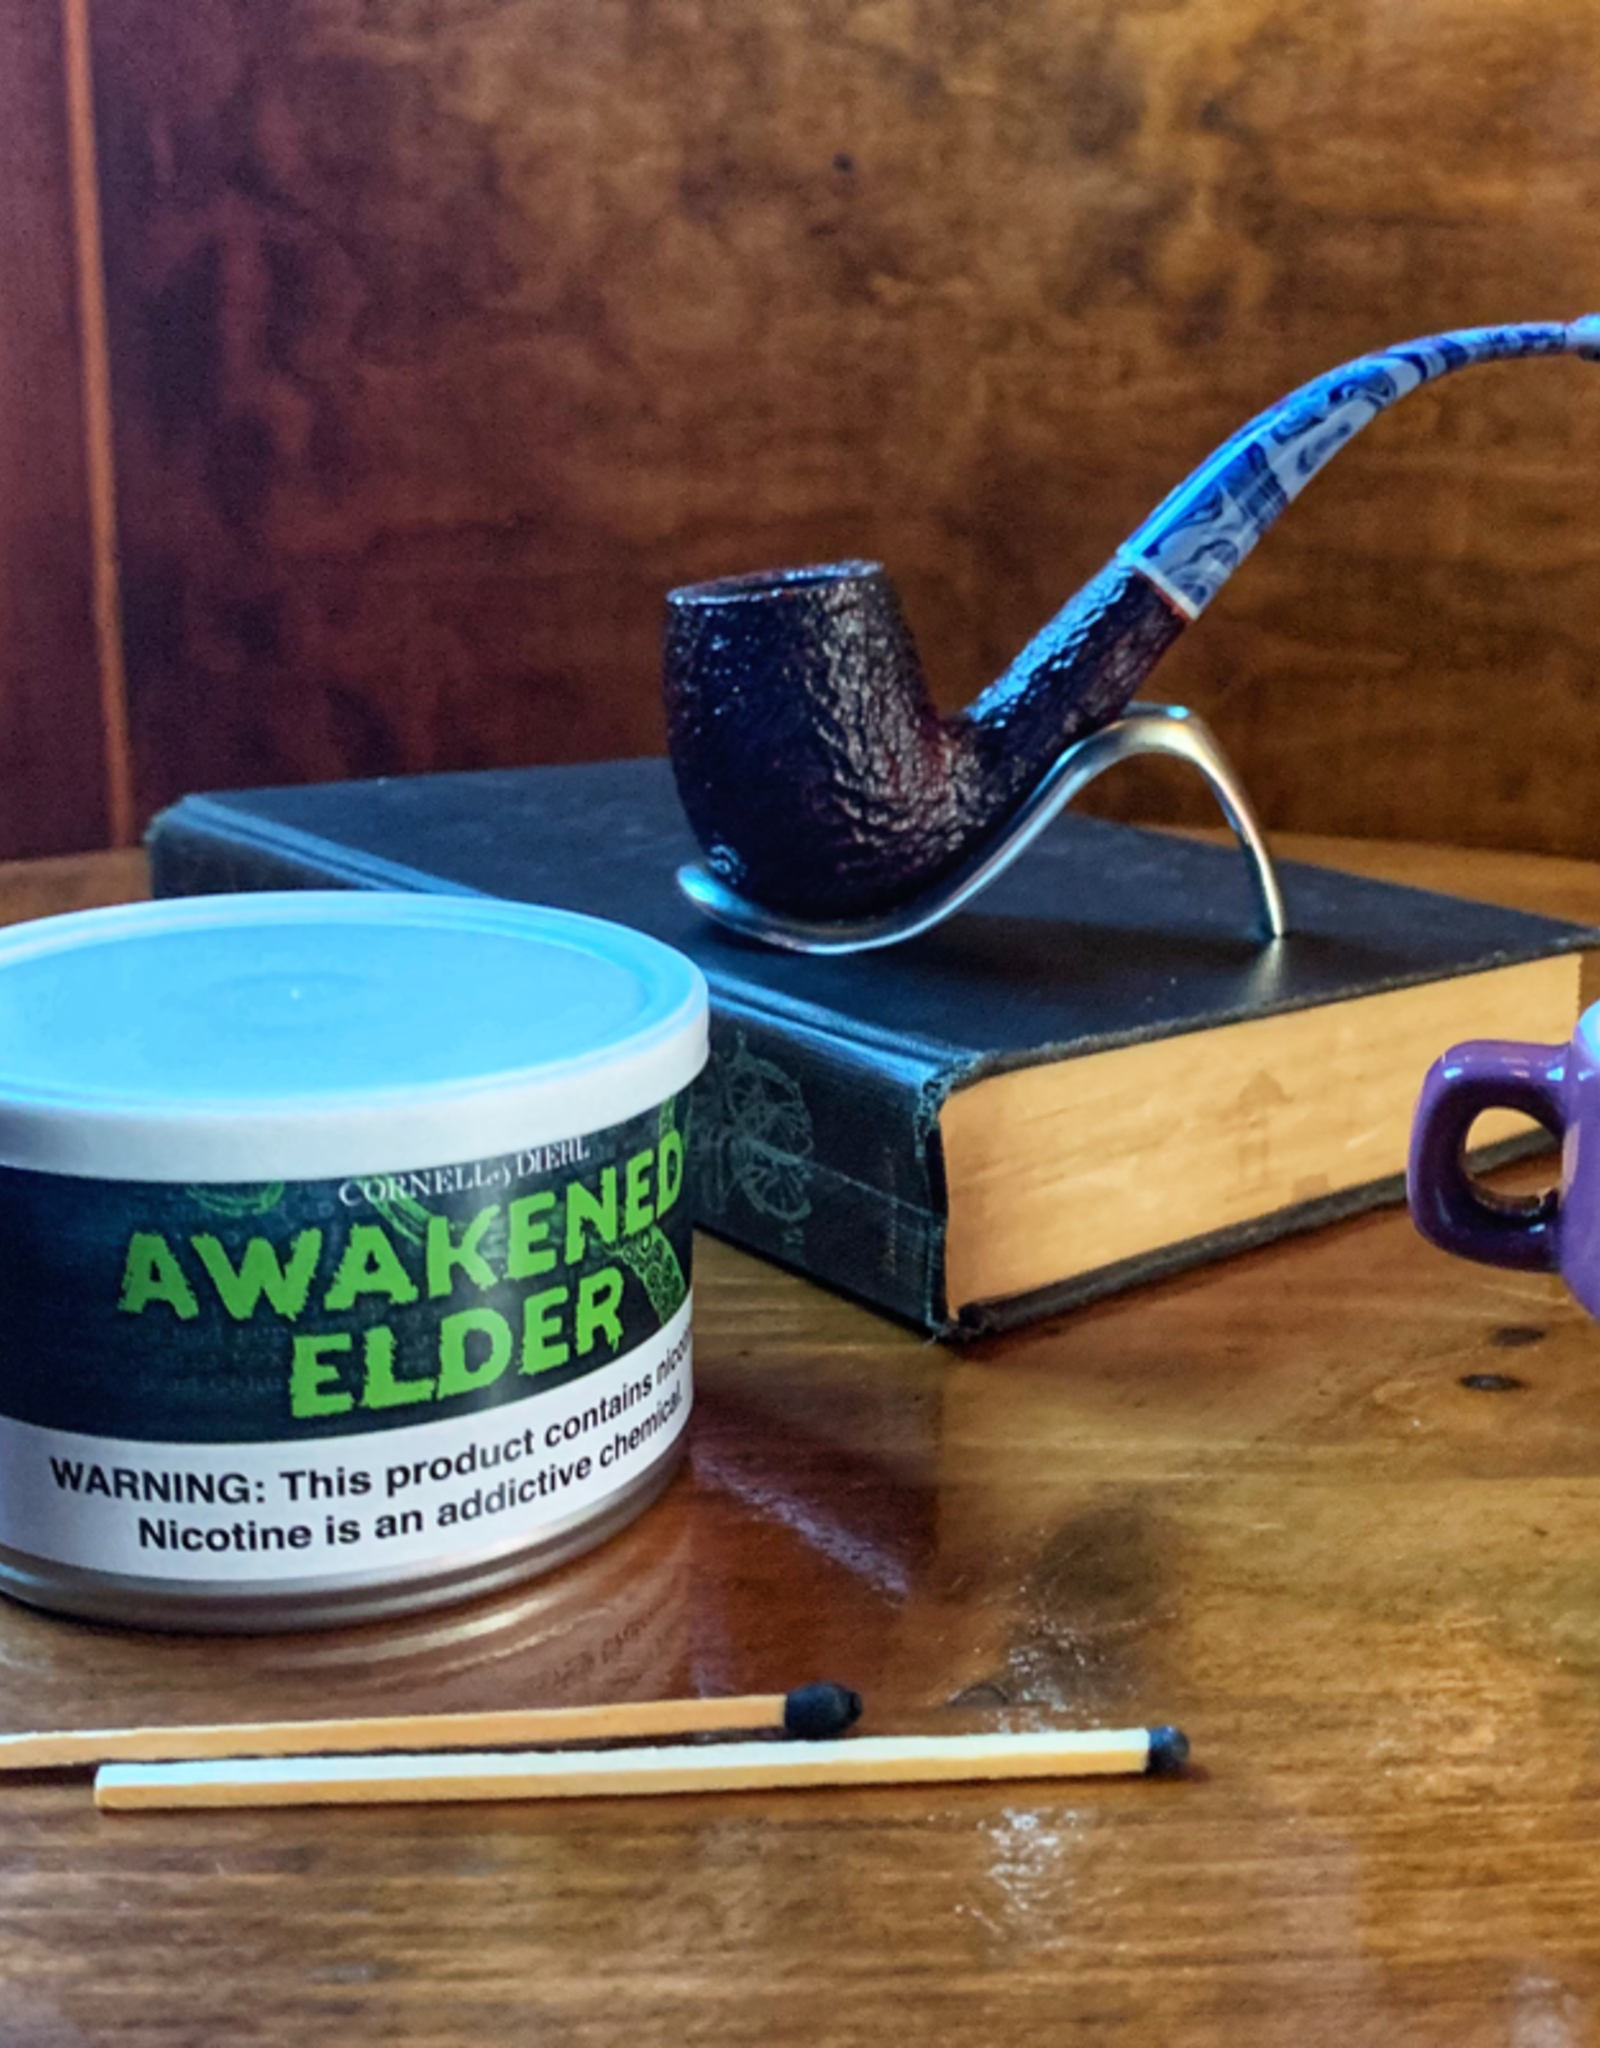 Cornell & Diehl Cornell & Diehl Pipe Tobacco Awakened Elder